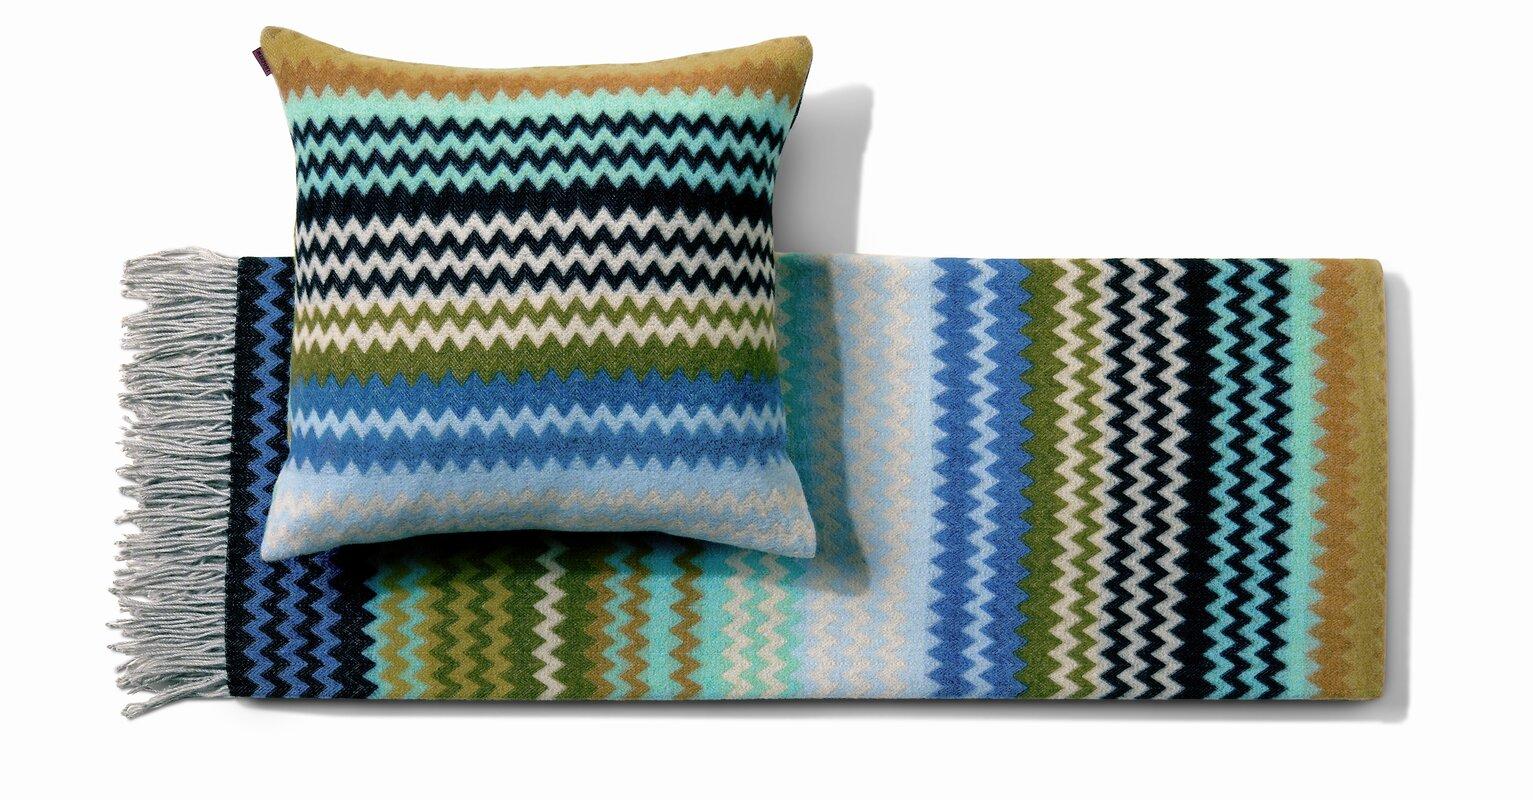 cushions and throws humbert throw  reviews  allmodern - defaultname